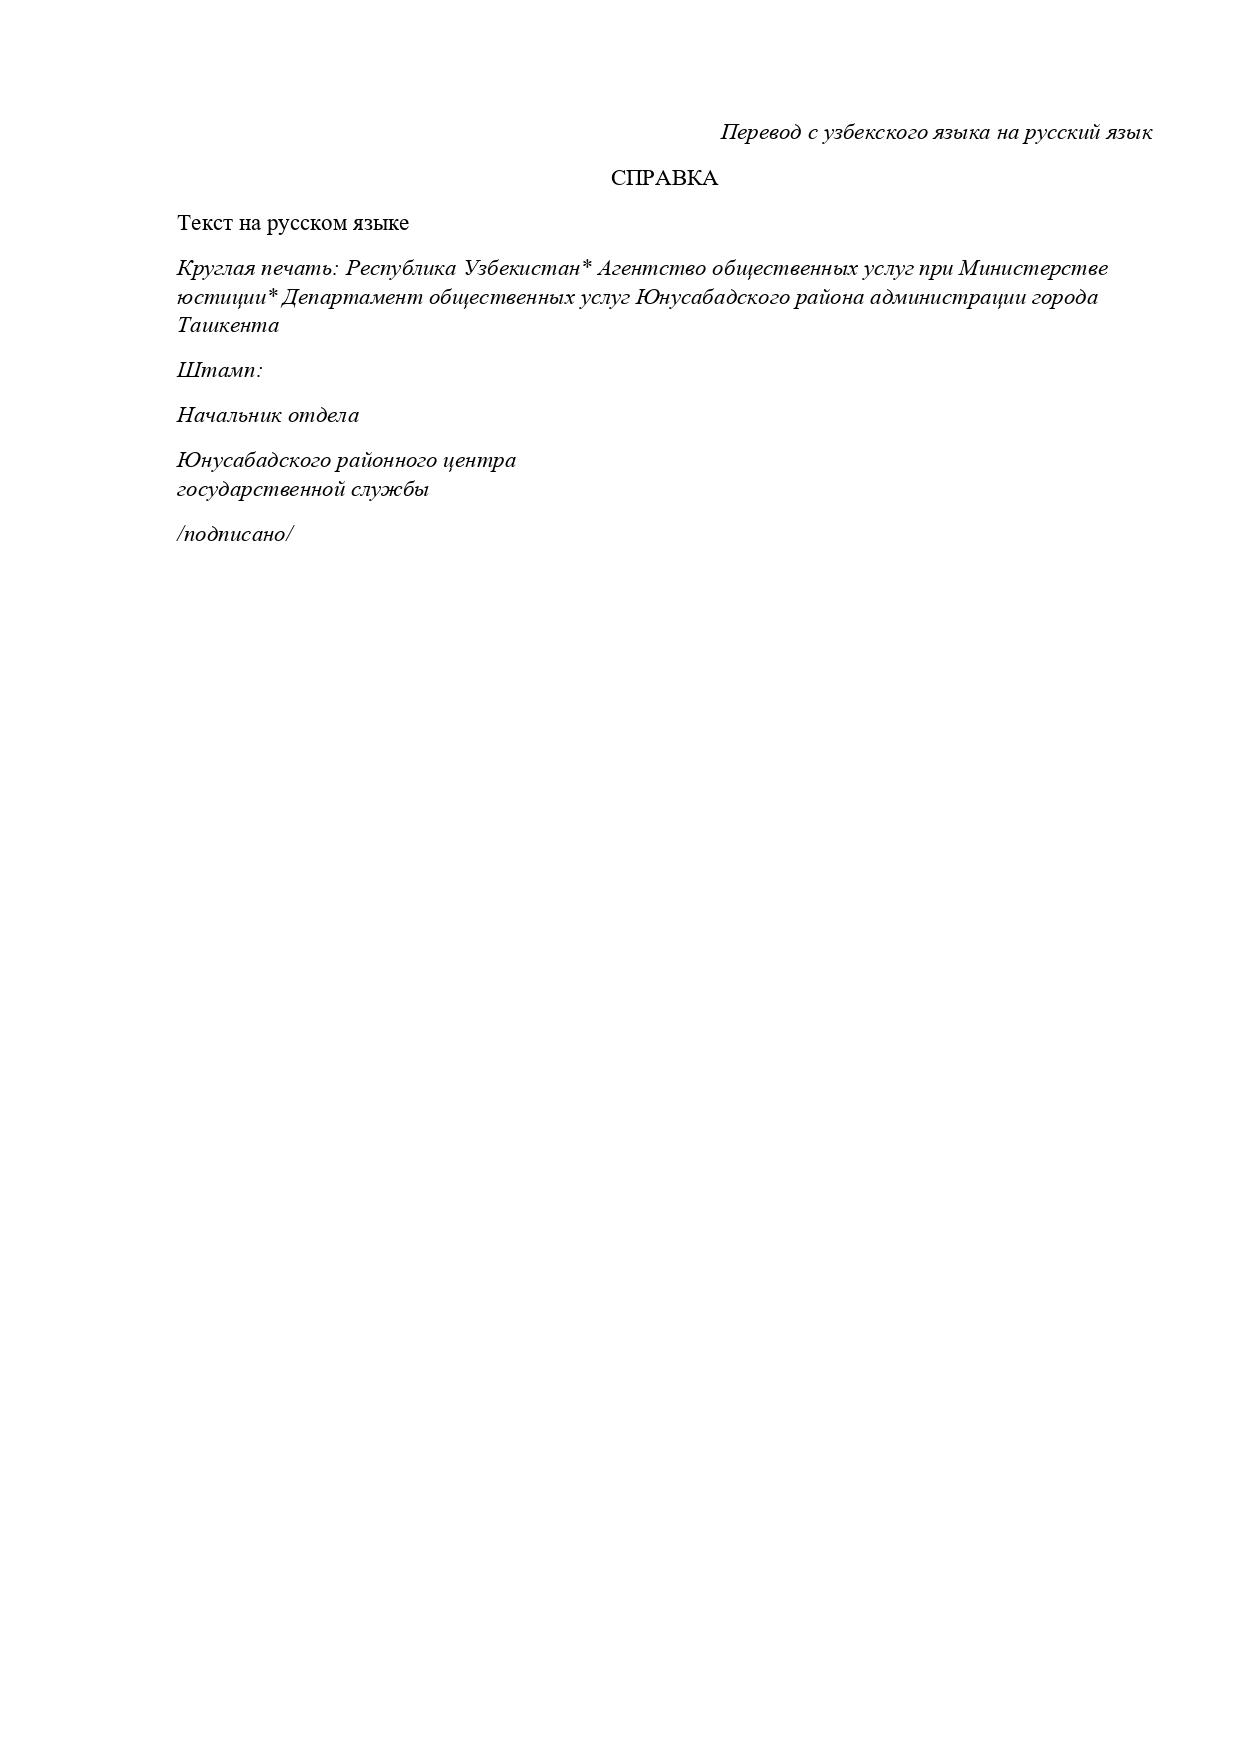 Пример перевода печати с узбекского языка